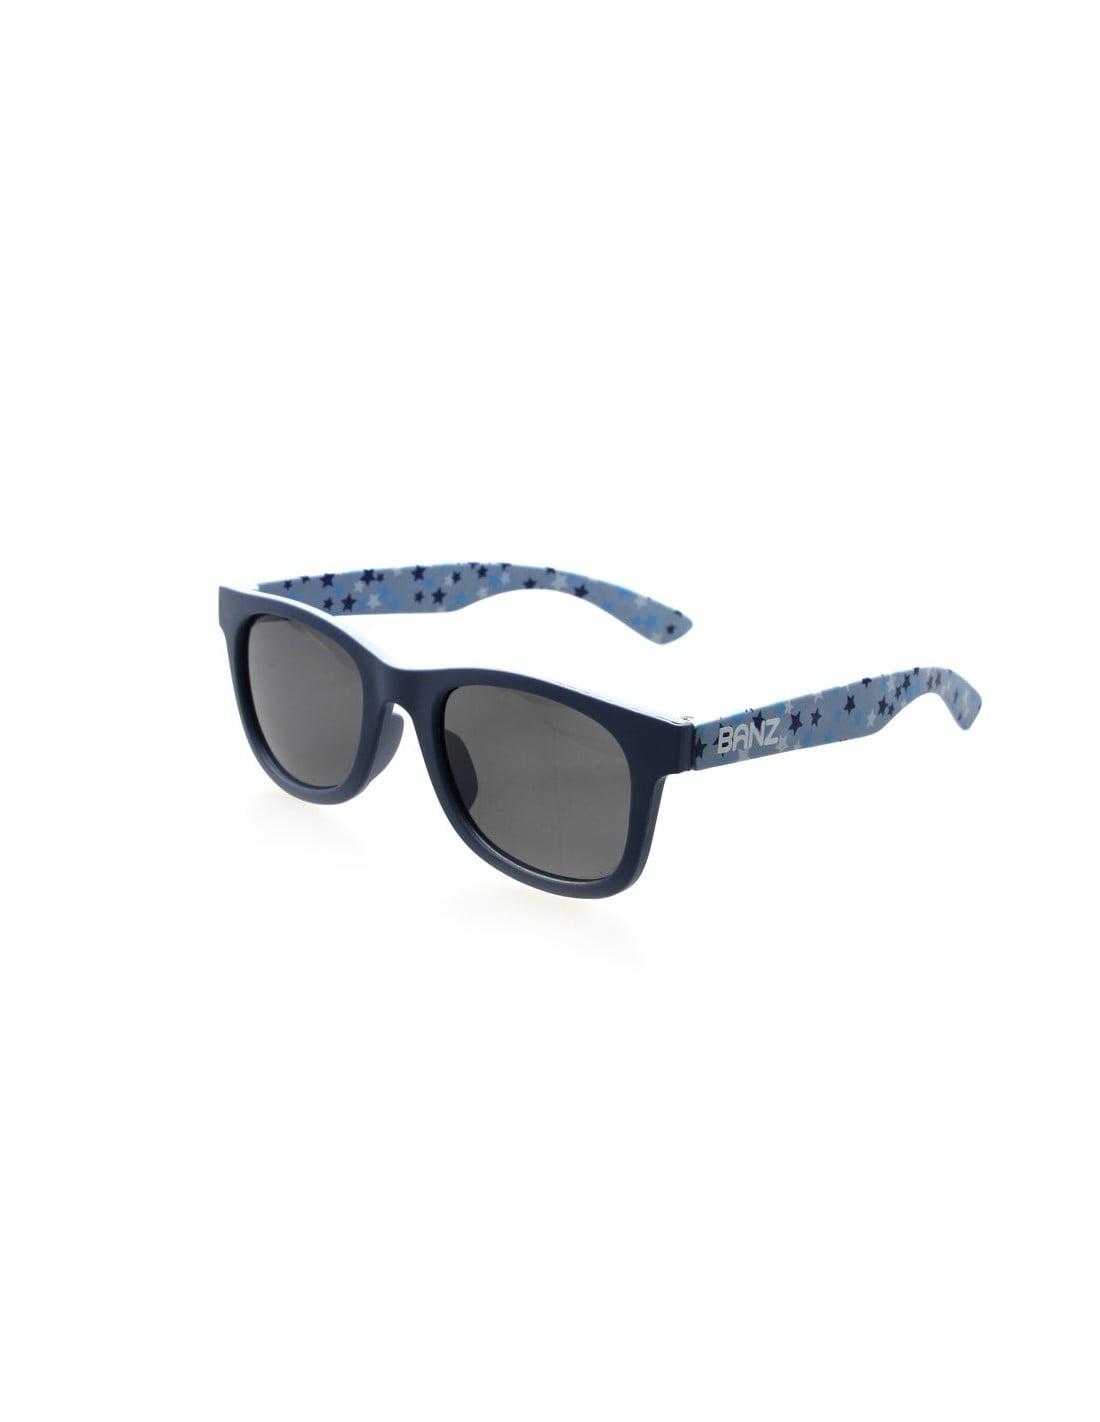 Ochelari de soare J-Banz Beachcomber Starry Night